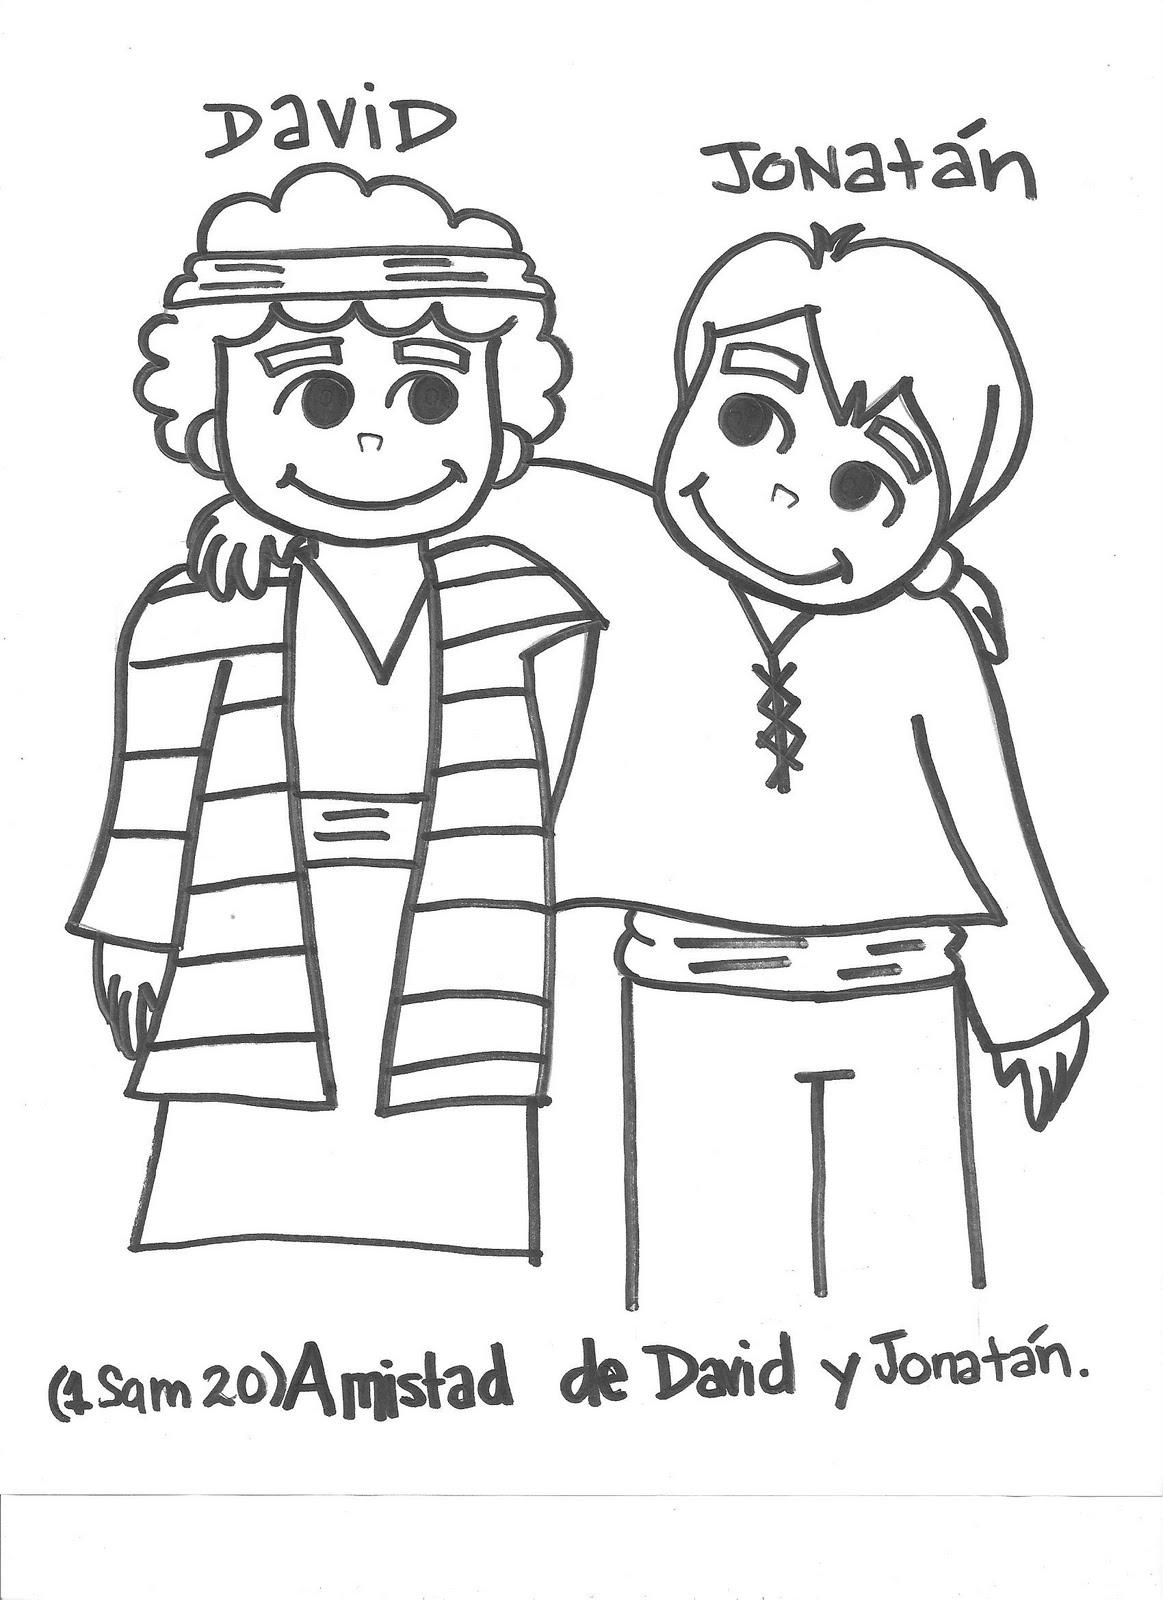 David and jonathan coloring pages free